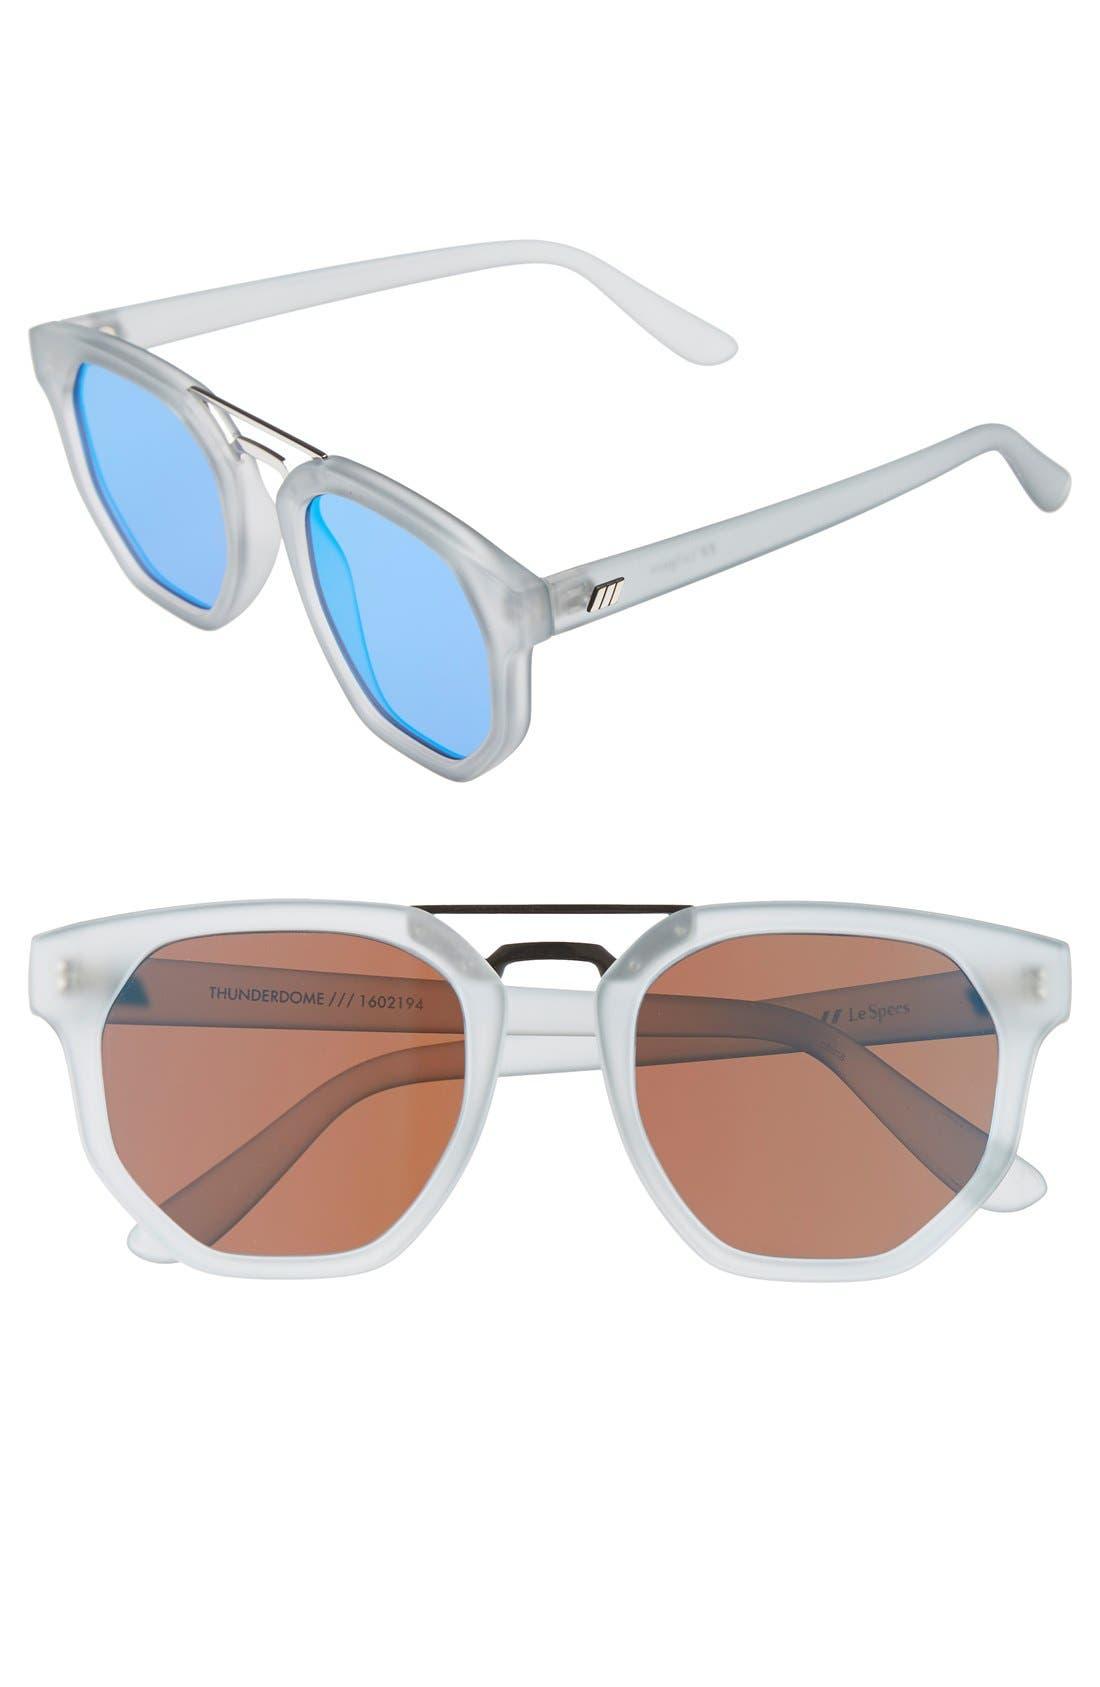 LE SPECS 'Thunderdome' 52mm Sunglasses